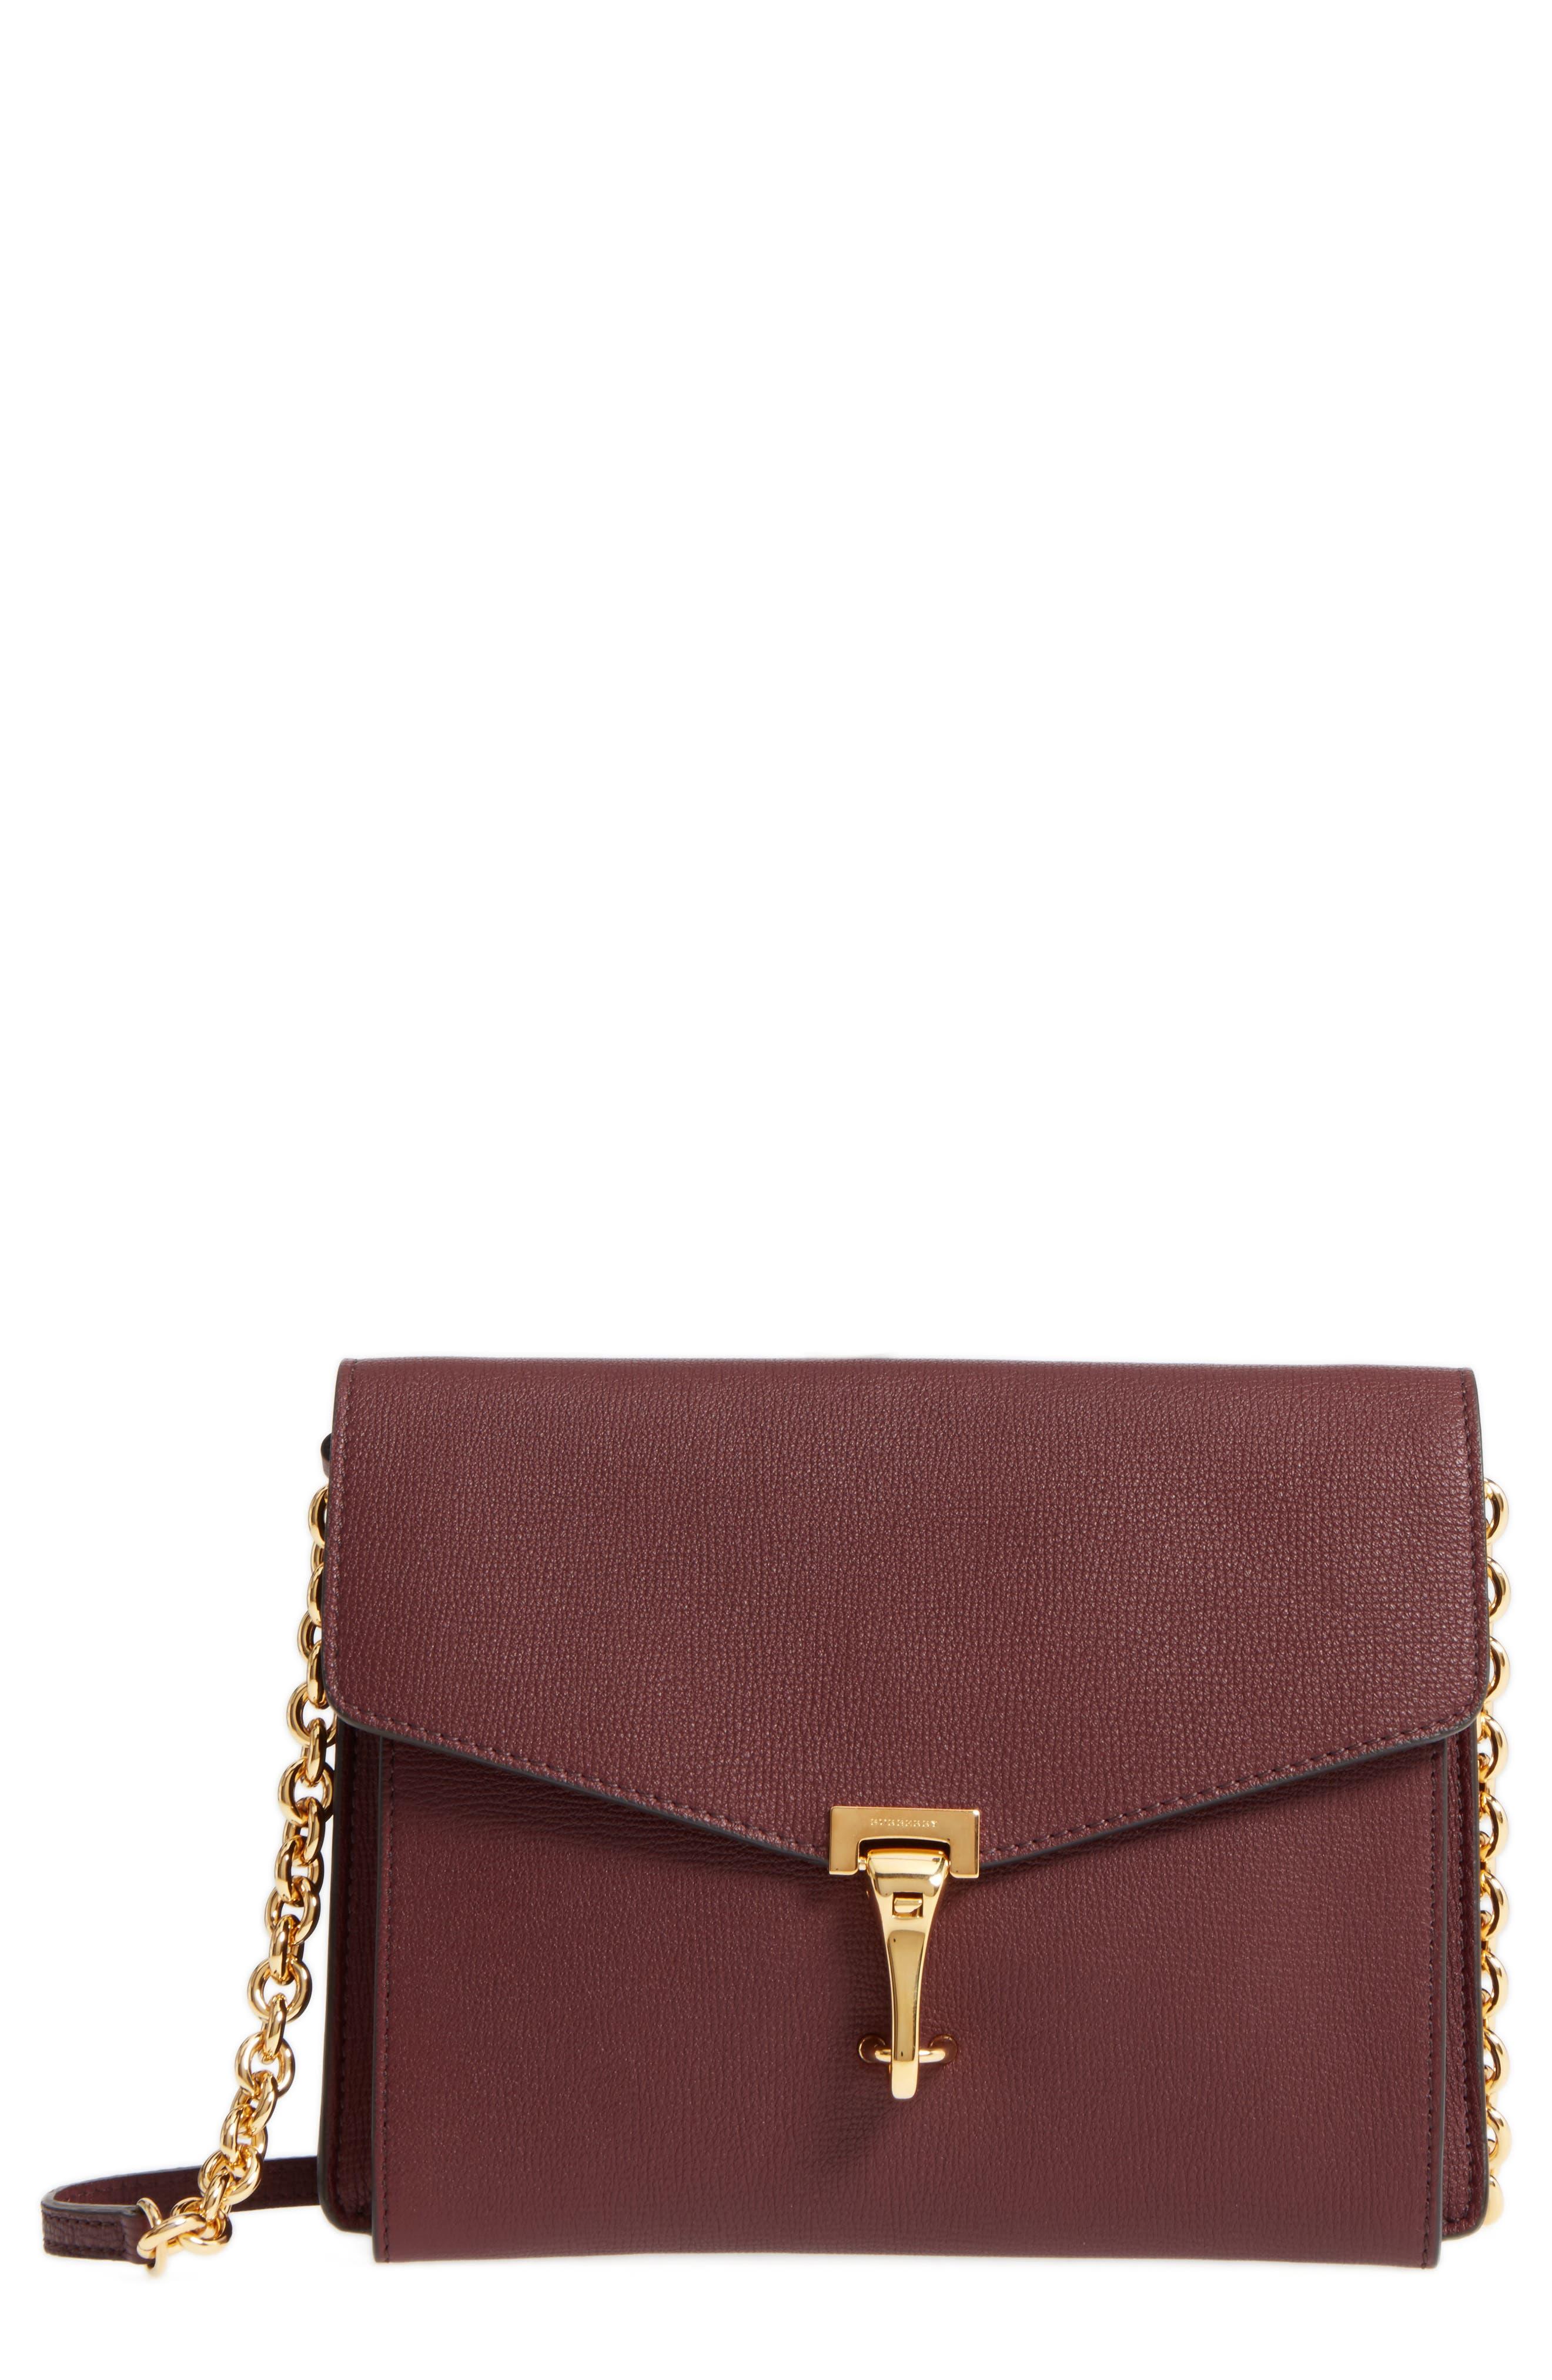 Macken Leather Derby Crossbody Bag,                         Main,                         color, 606